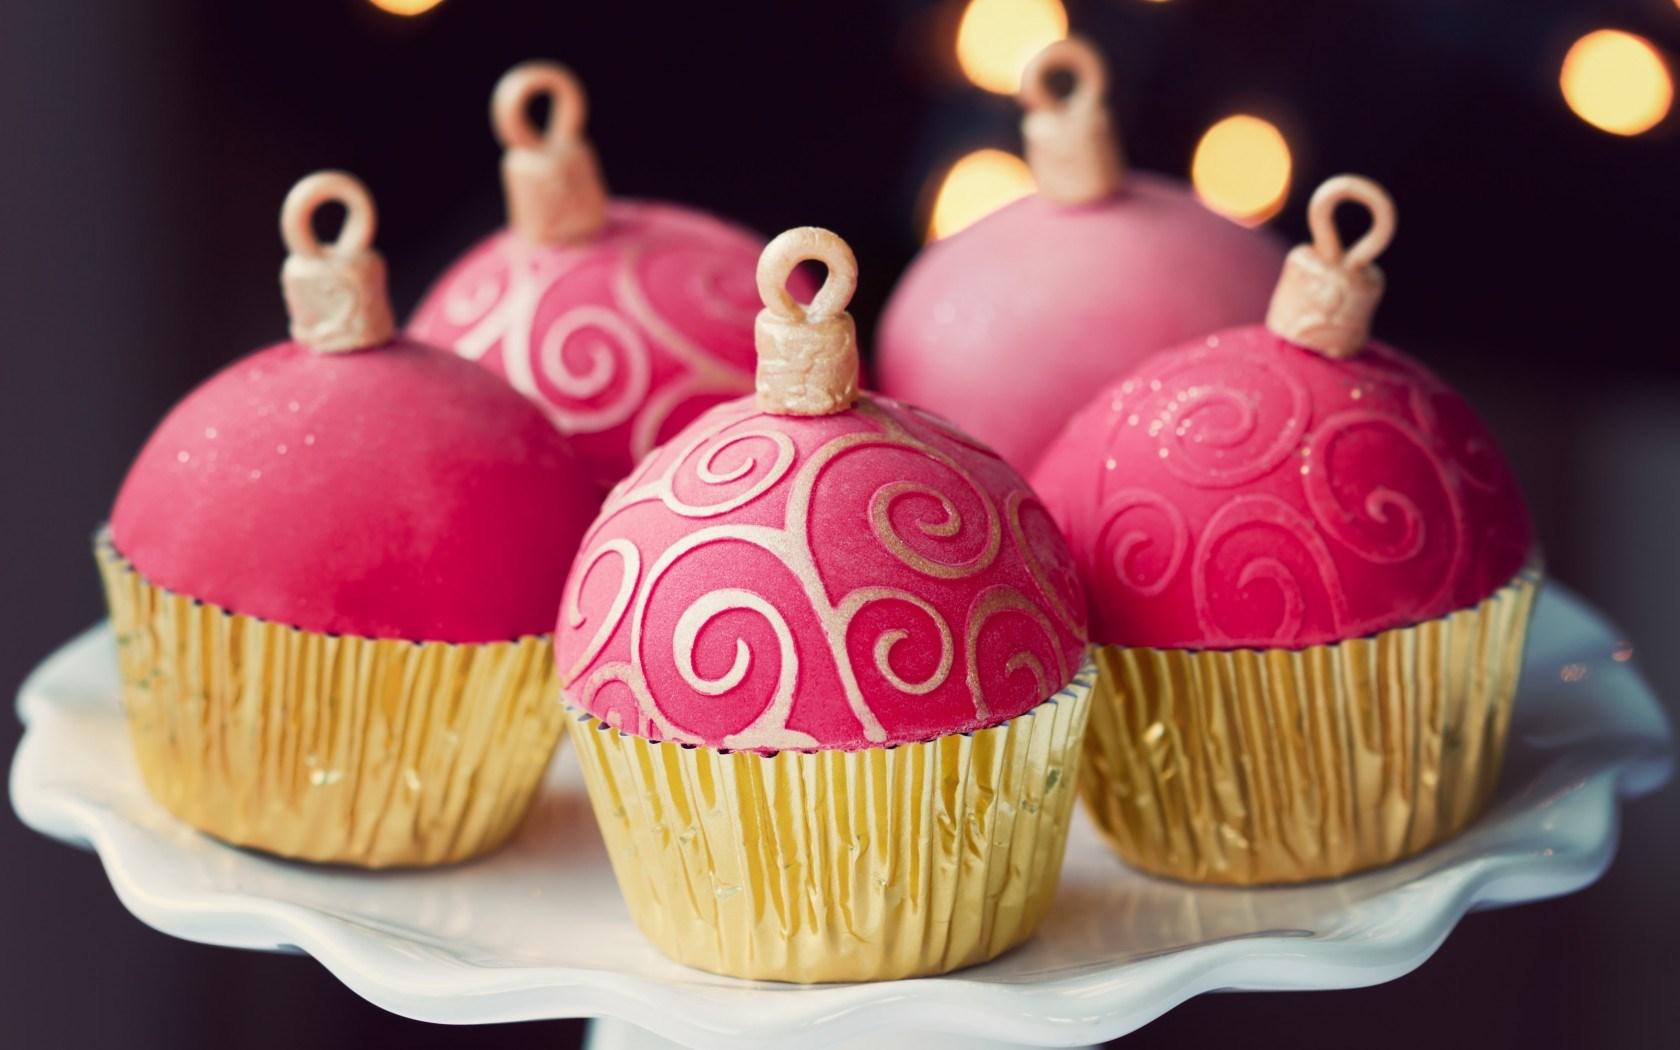 Cupcakes Dessert Sweet Food